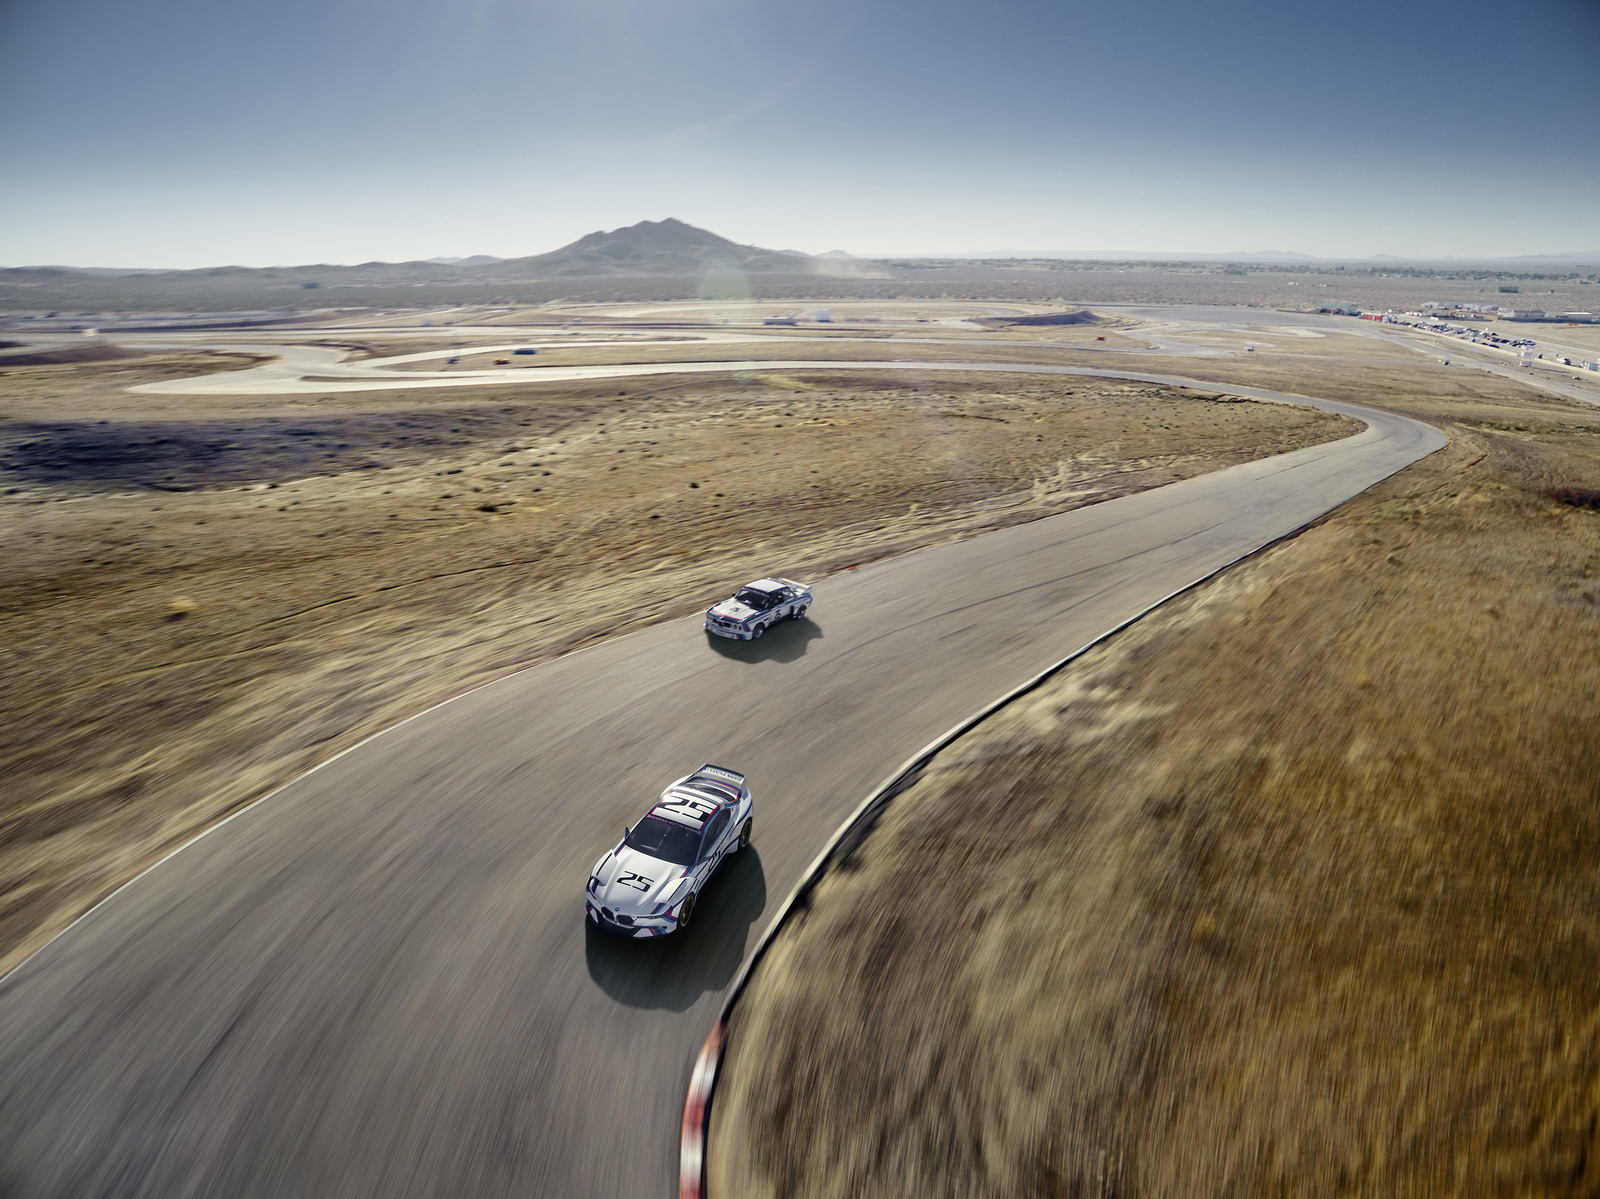 BMW-30-Hommage-R-Concept-12